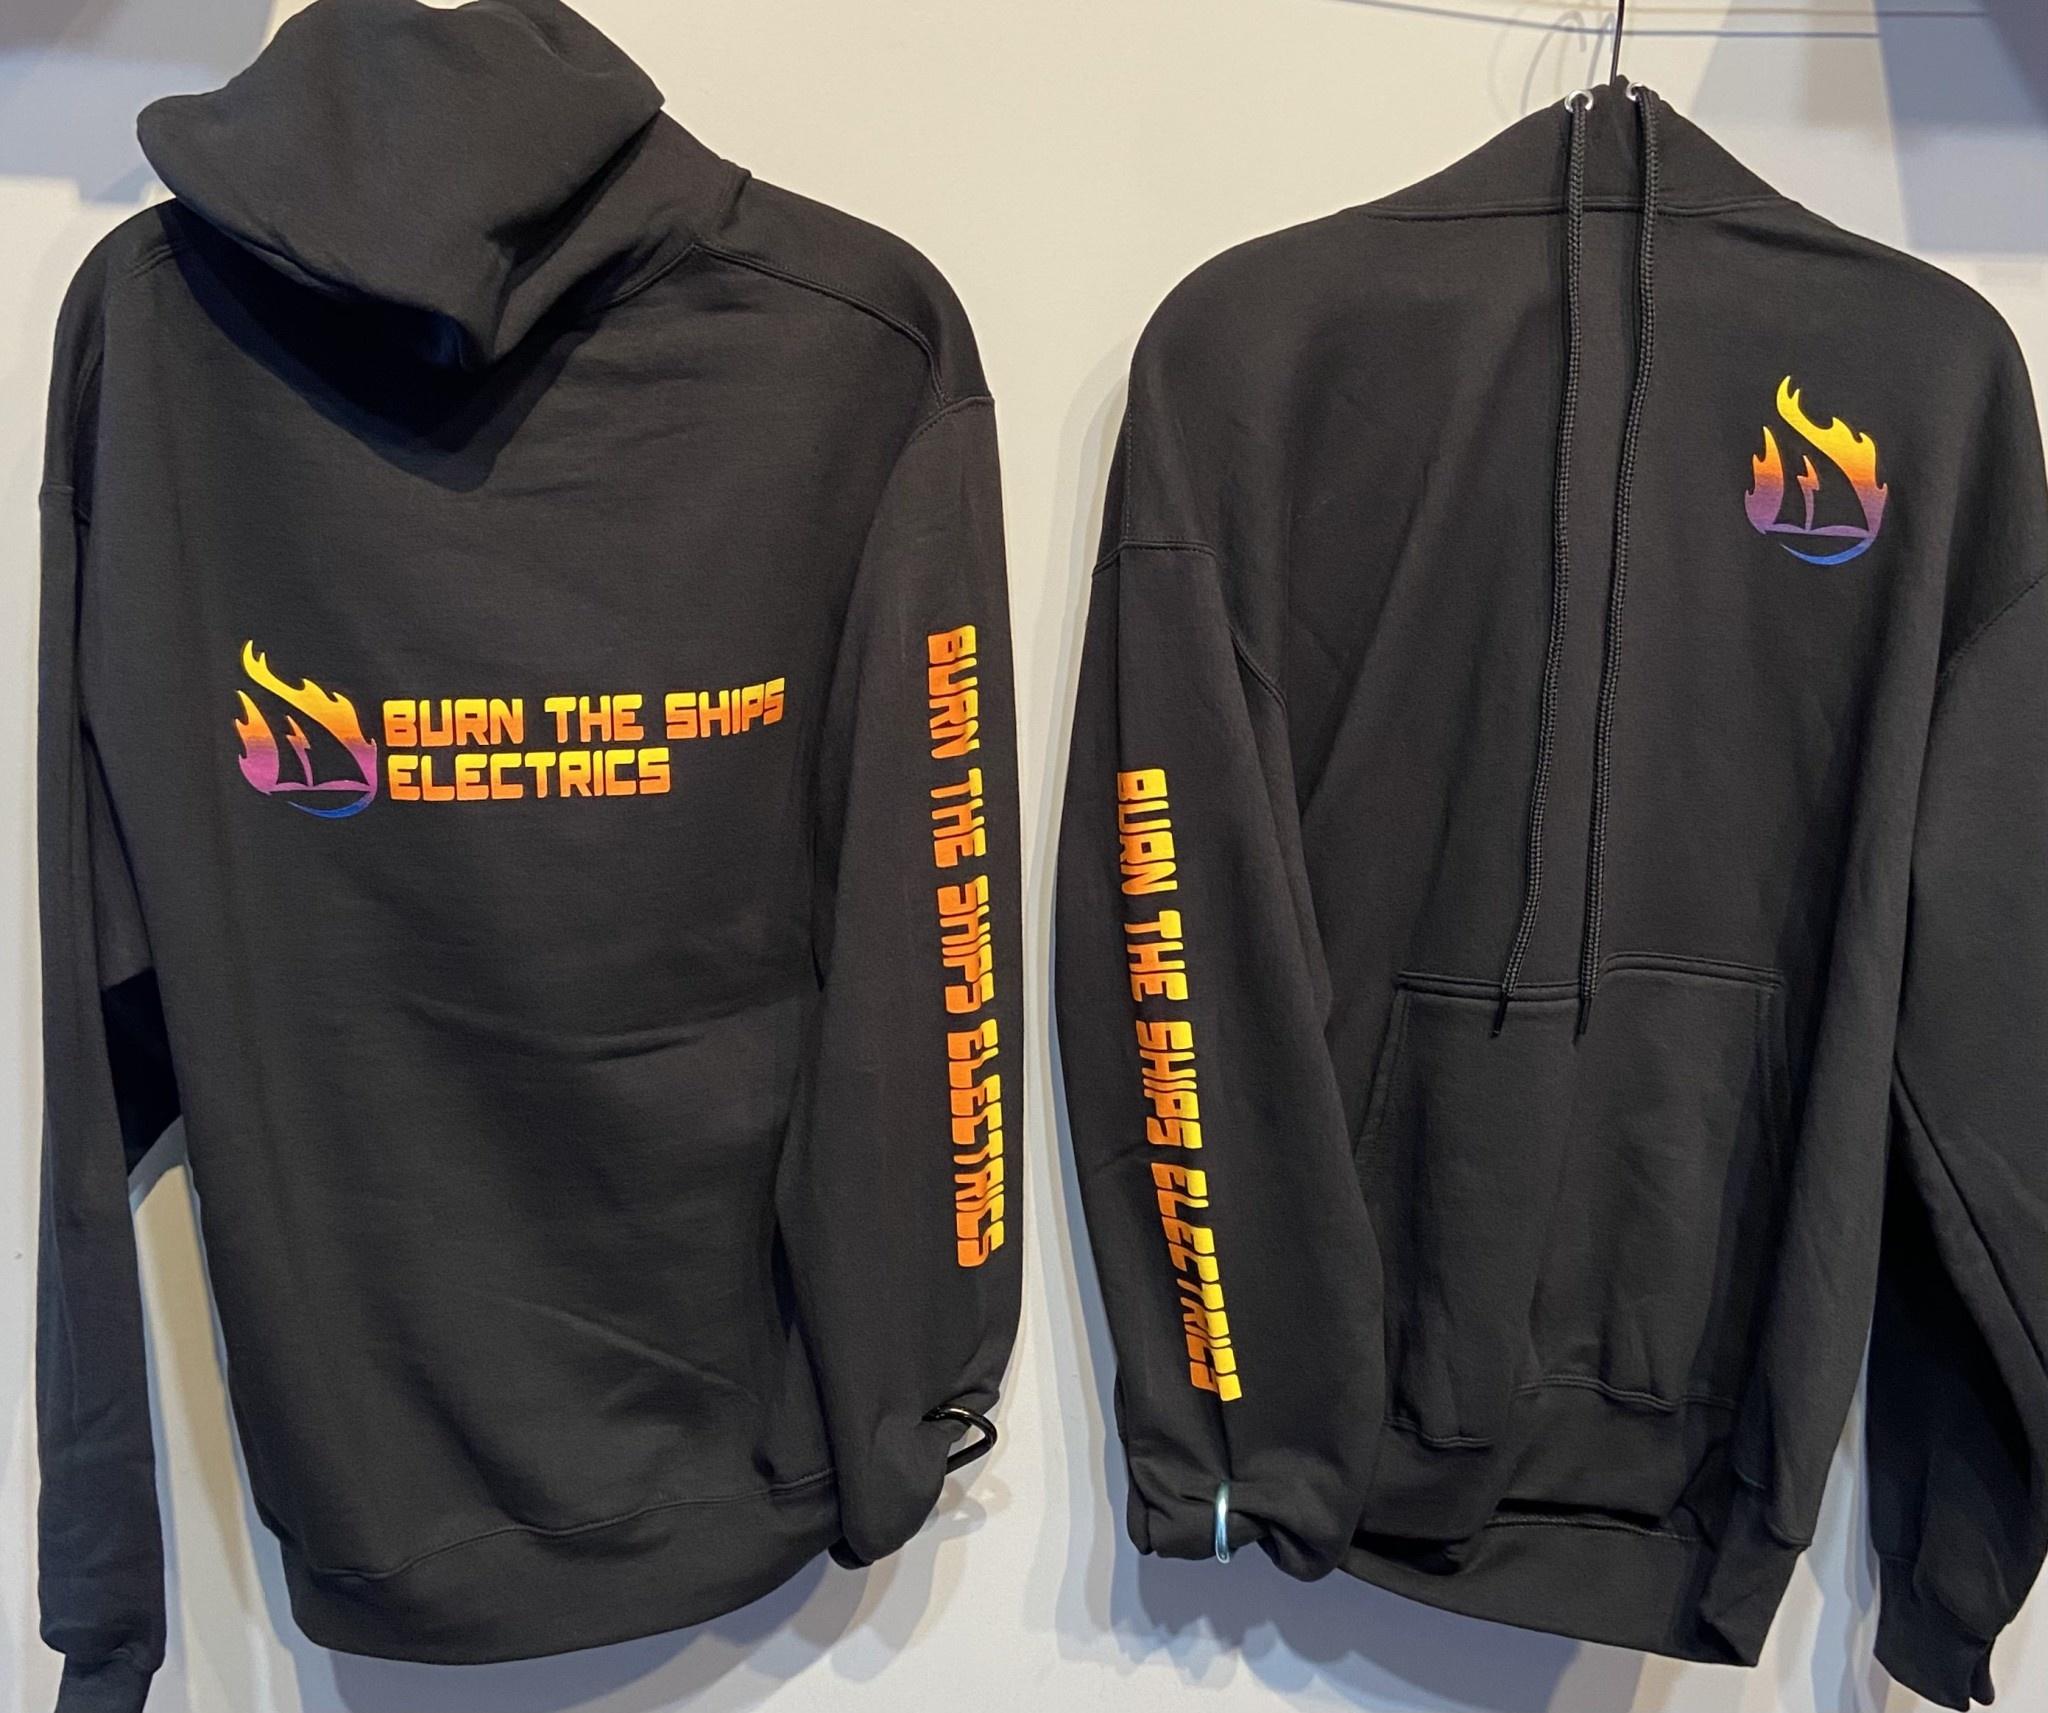 Burn The Ships Electrics BTSe Logo Pullover Hoodie